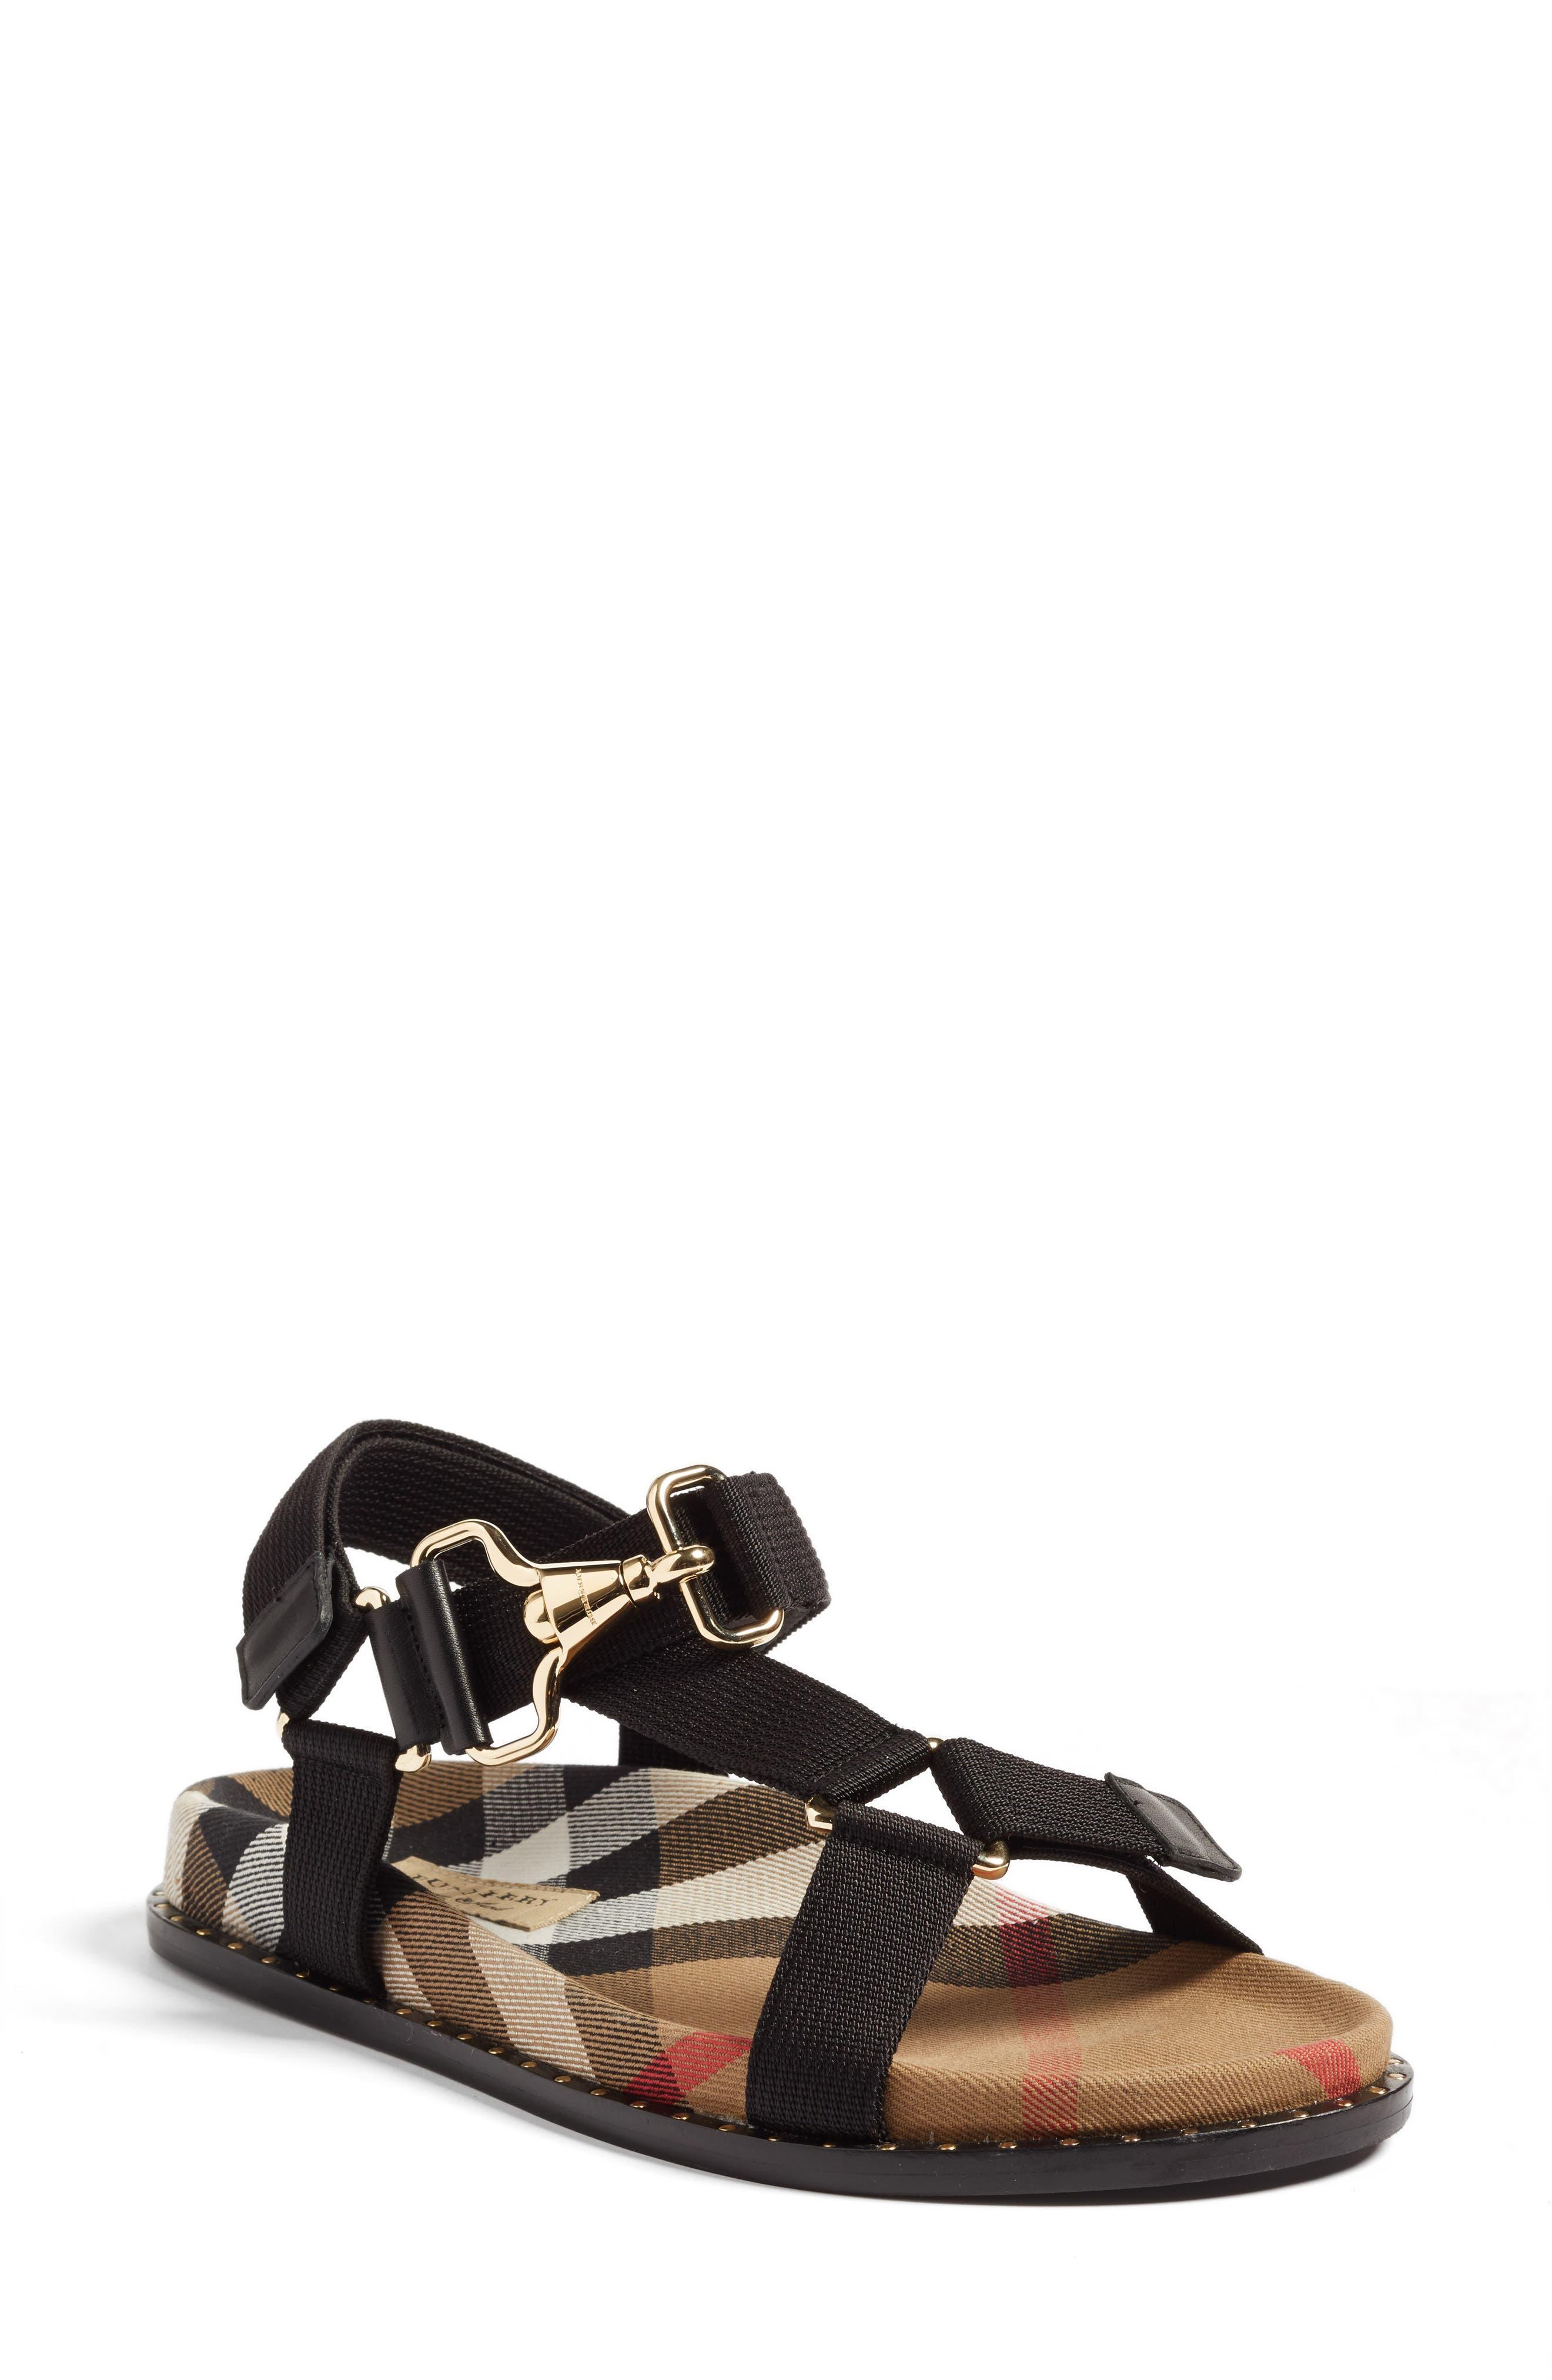 Ardall Sandal,                         Main,                         color, Black